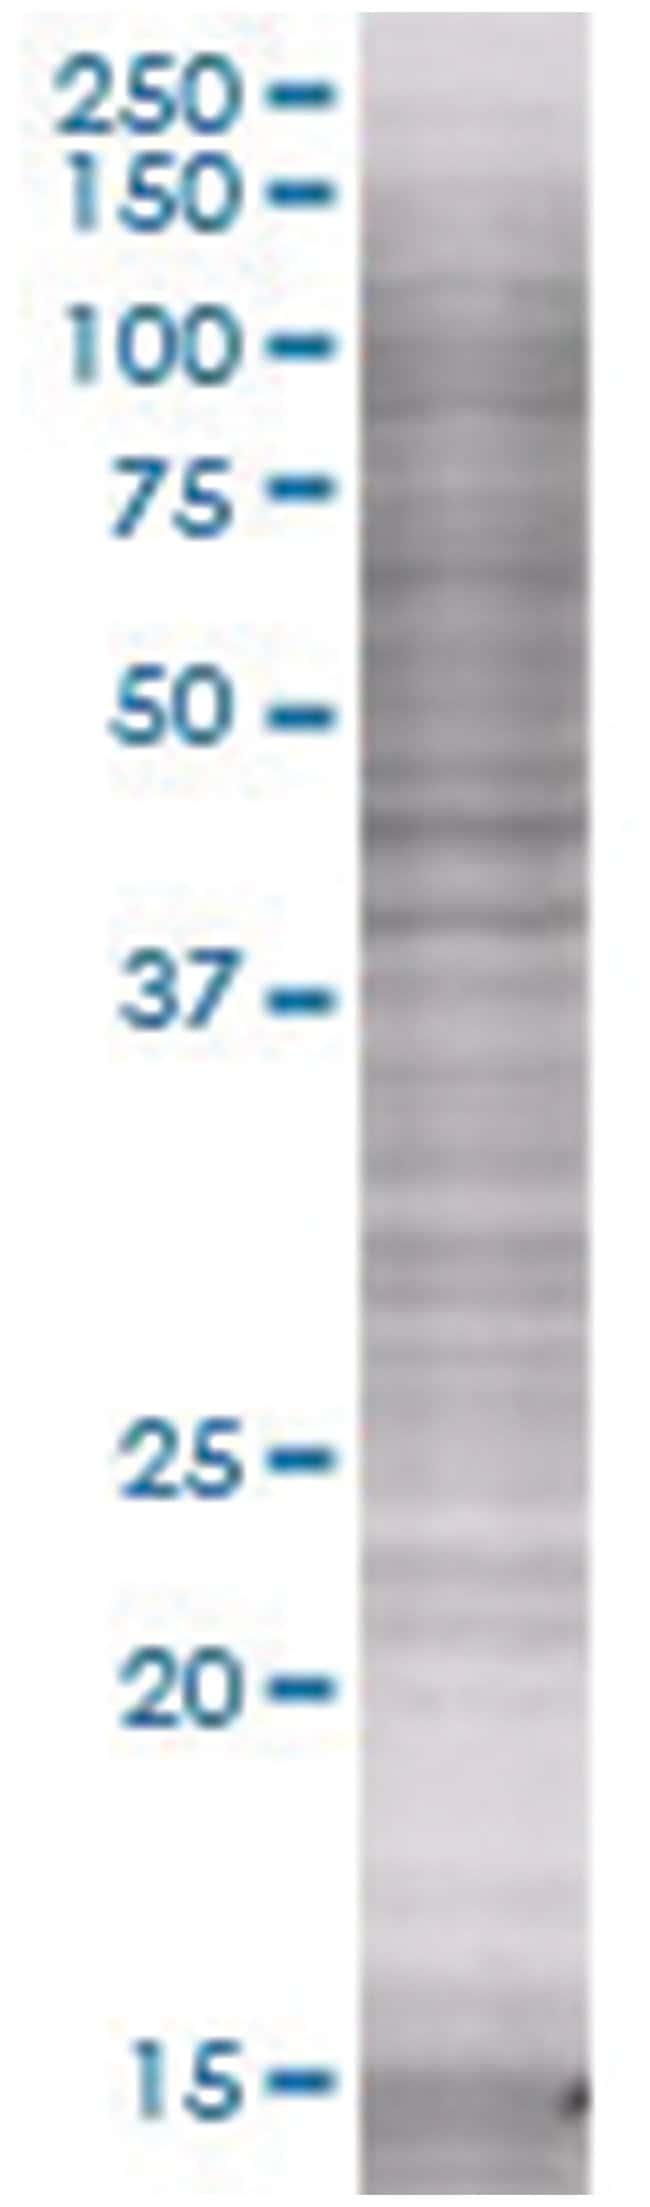 FLT1 293T Cell Overexpression Lysate (Denatured), Abnova 100µL:Life